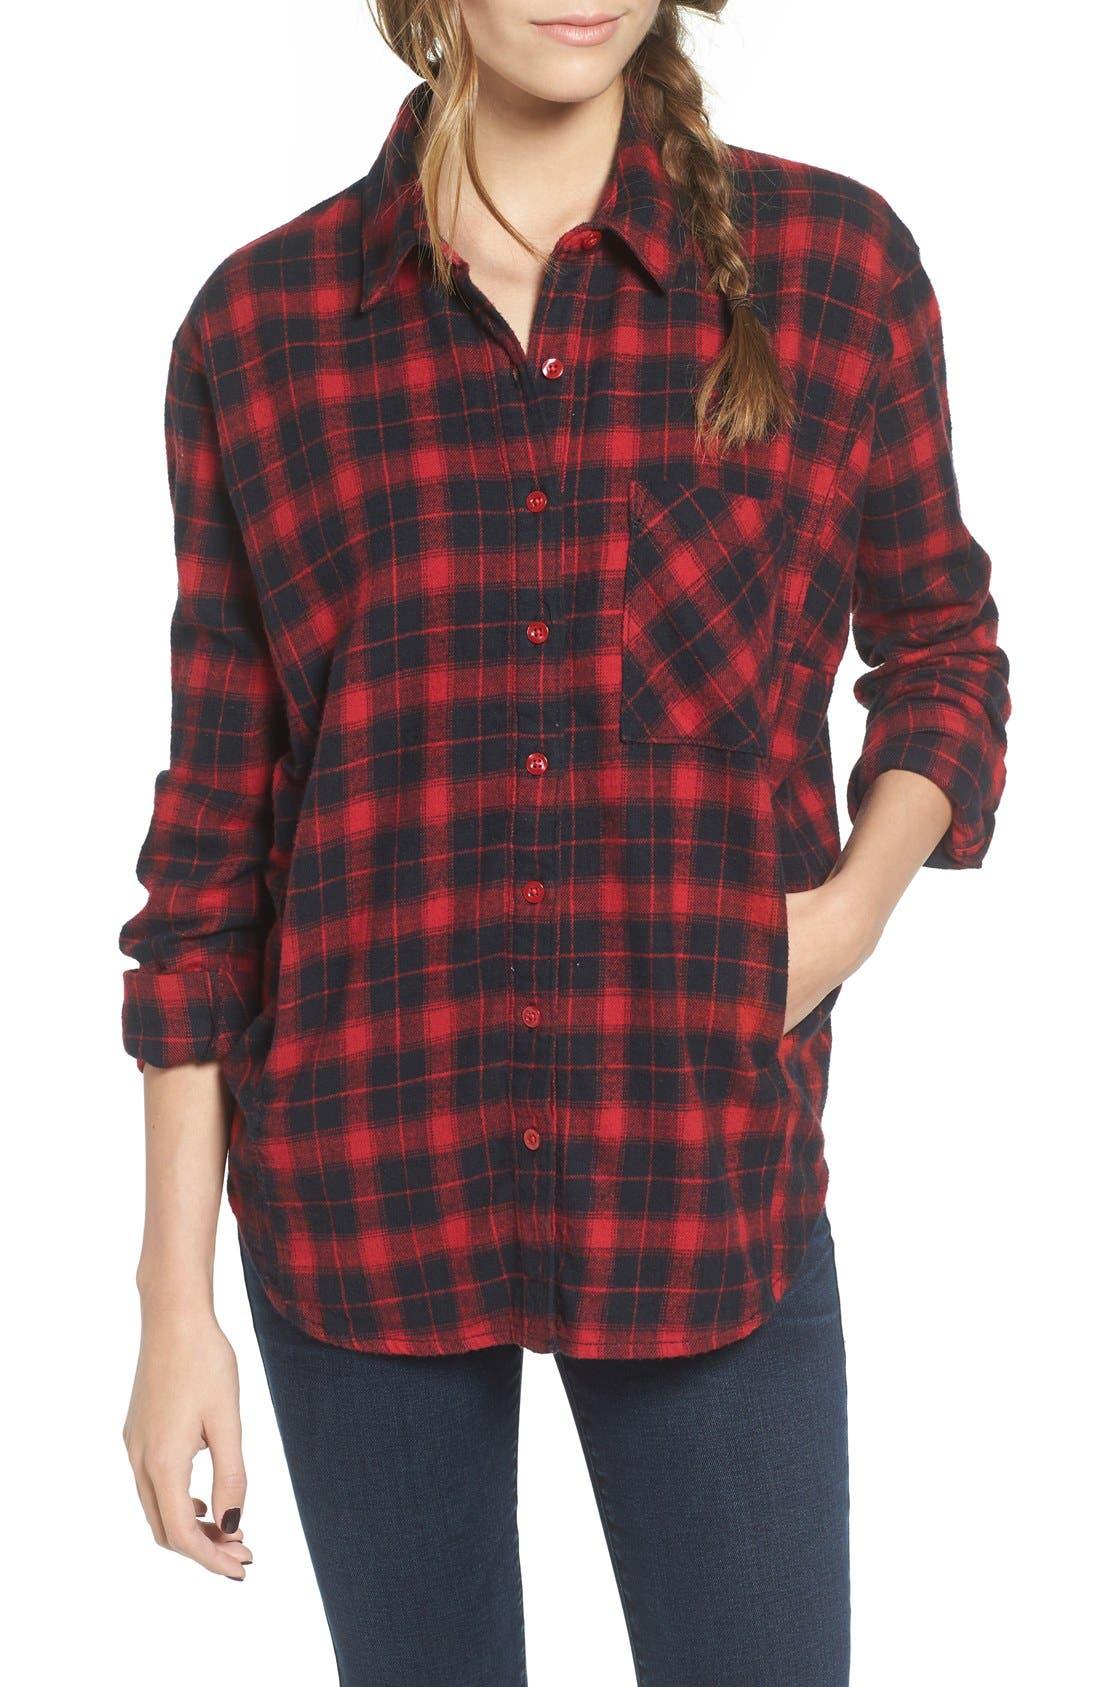 Alternate Image 1 Selected - BP. Plaid Flannel Shirt